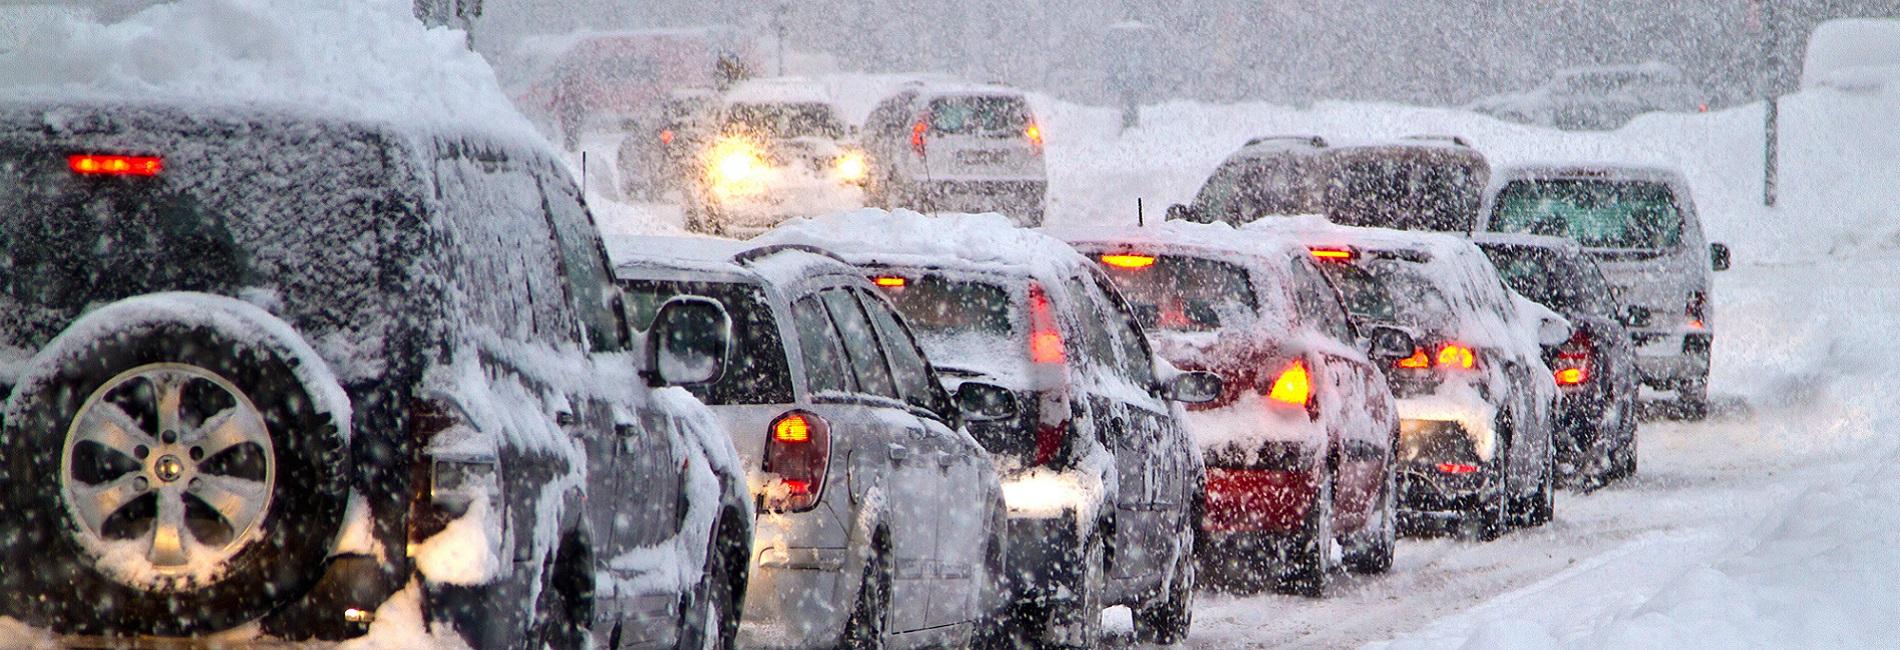 Talviautoilun riemuja - Nollis-blogi, Susanna Puumi, HYKS/HUS